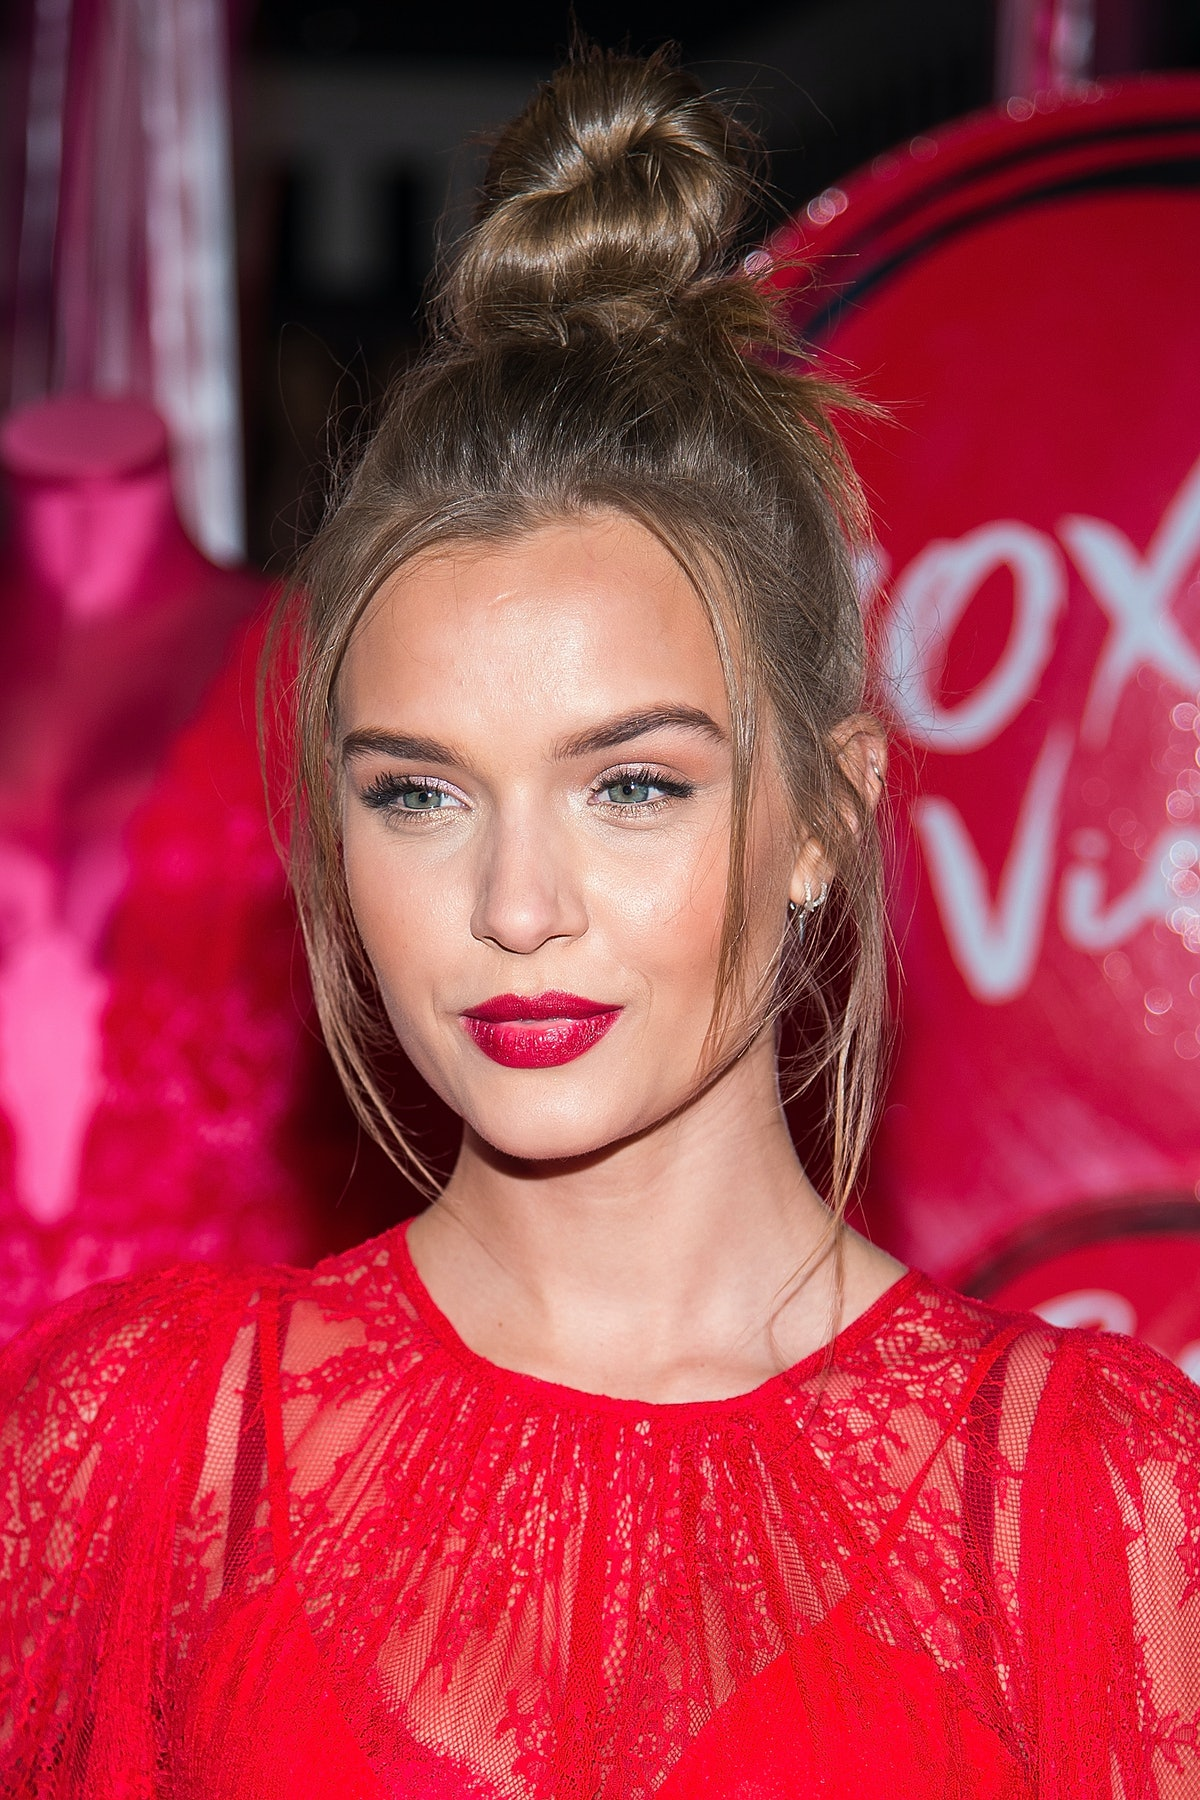 Victoria's Secret Angels Josephine Skriver, Sara Sampaio & Taylor Hill Share Their Hottest Gift Pick...